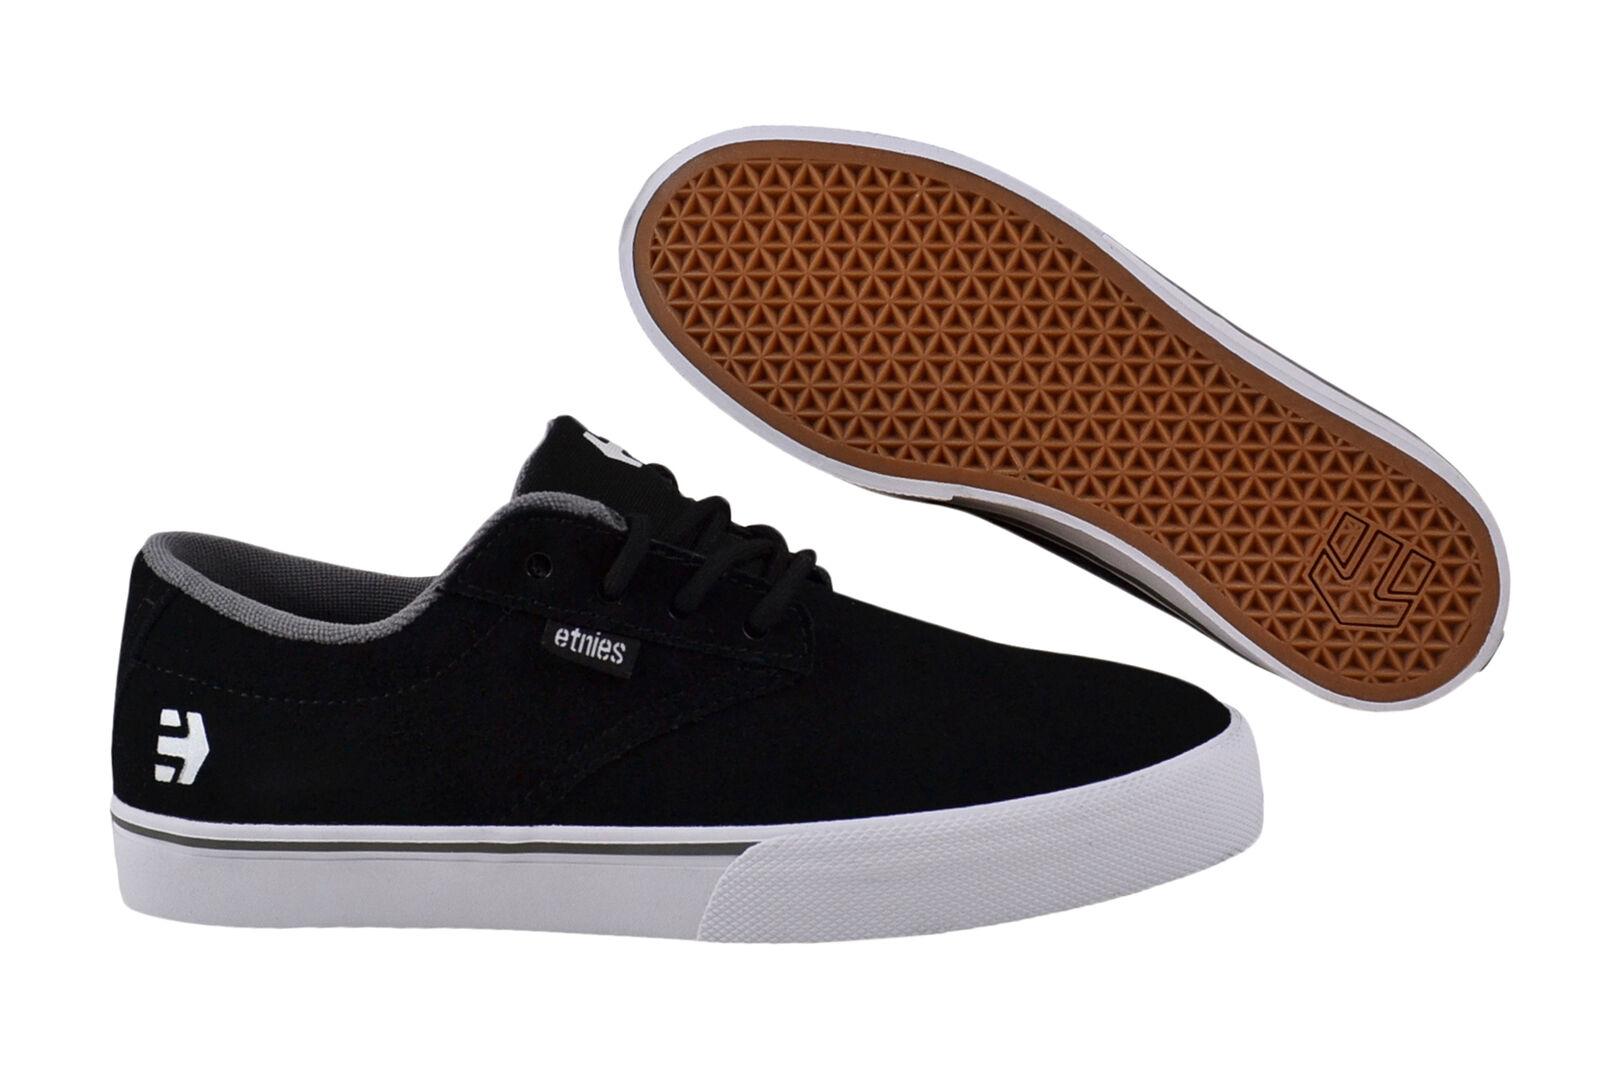 Etnies Vulc Jameson Vulc Etnies W's schwarz/Weiß Sneaker/Schuhe schwarz e741ed